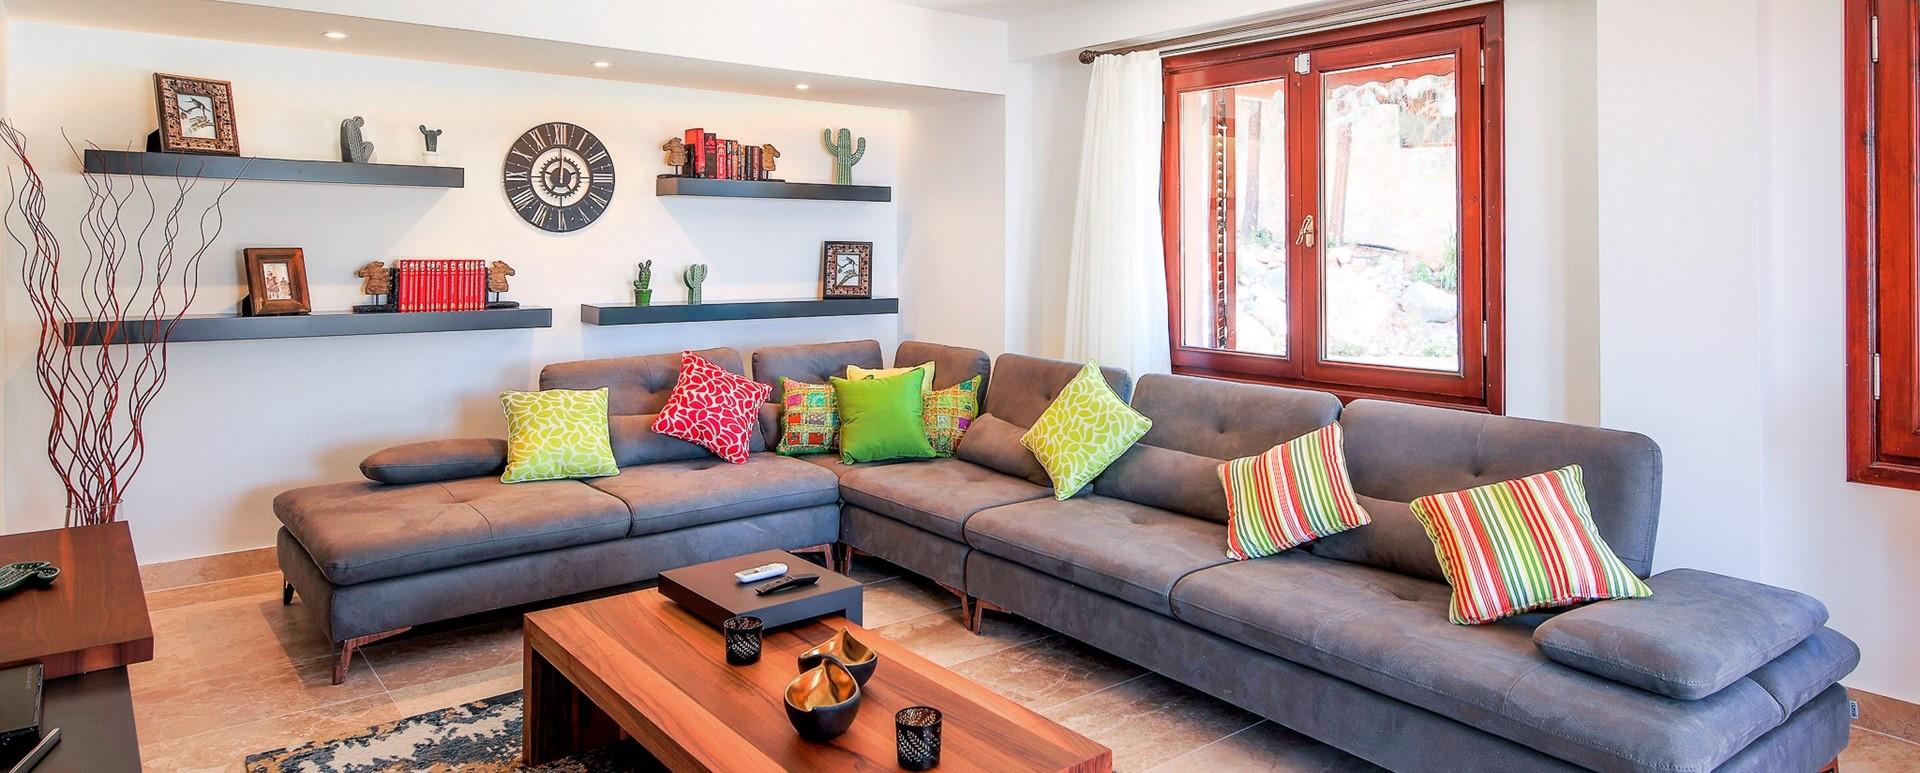 villa-caria-kalkan-tv-lounge